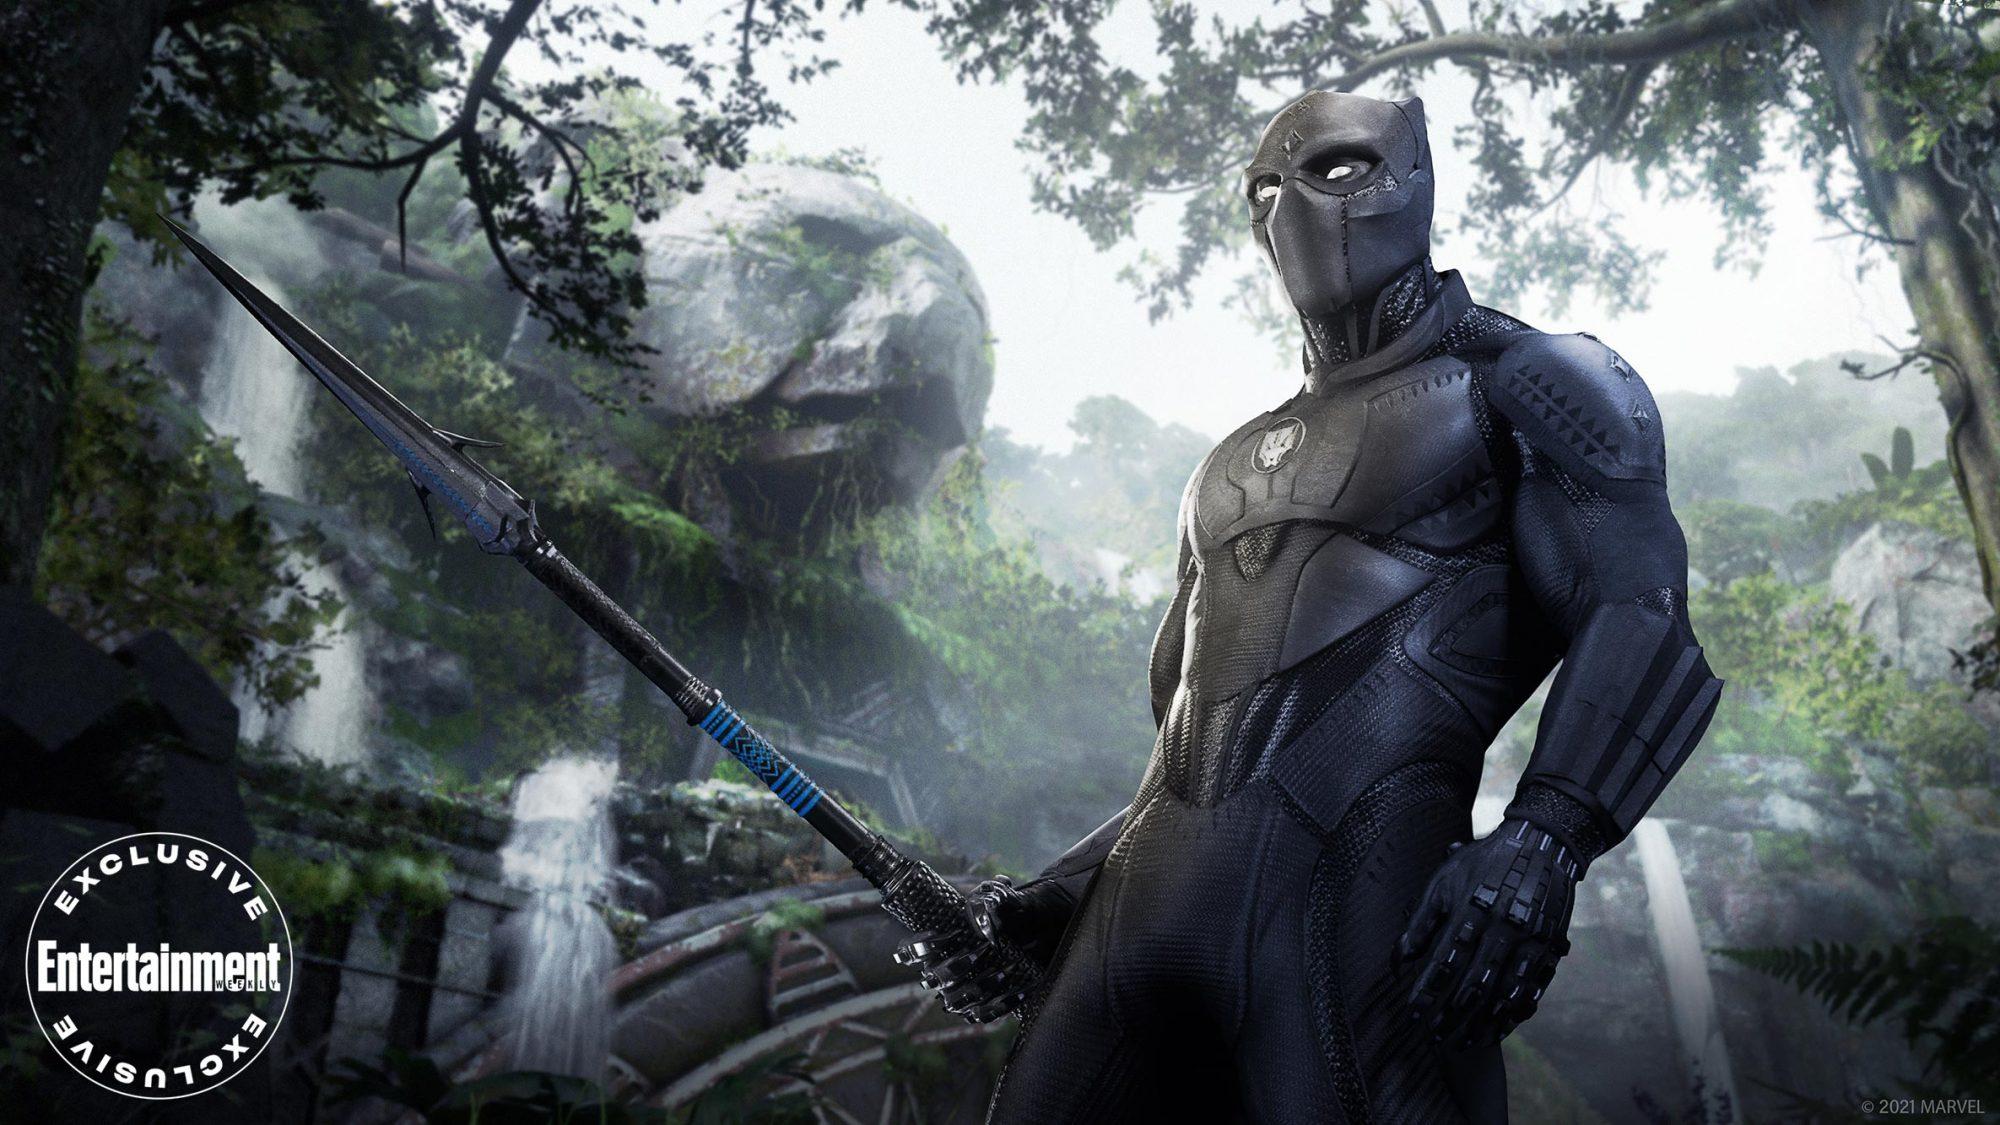 Marvel's Avengers game Black Panther